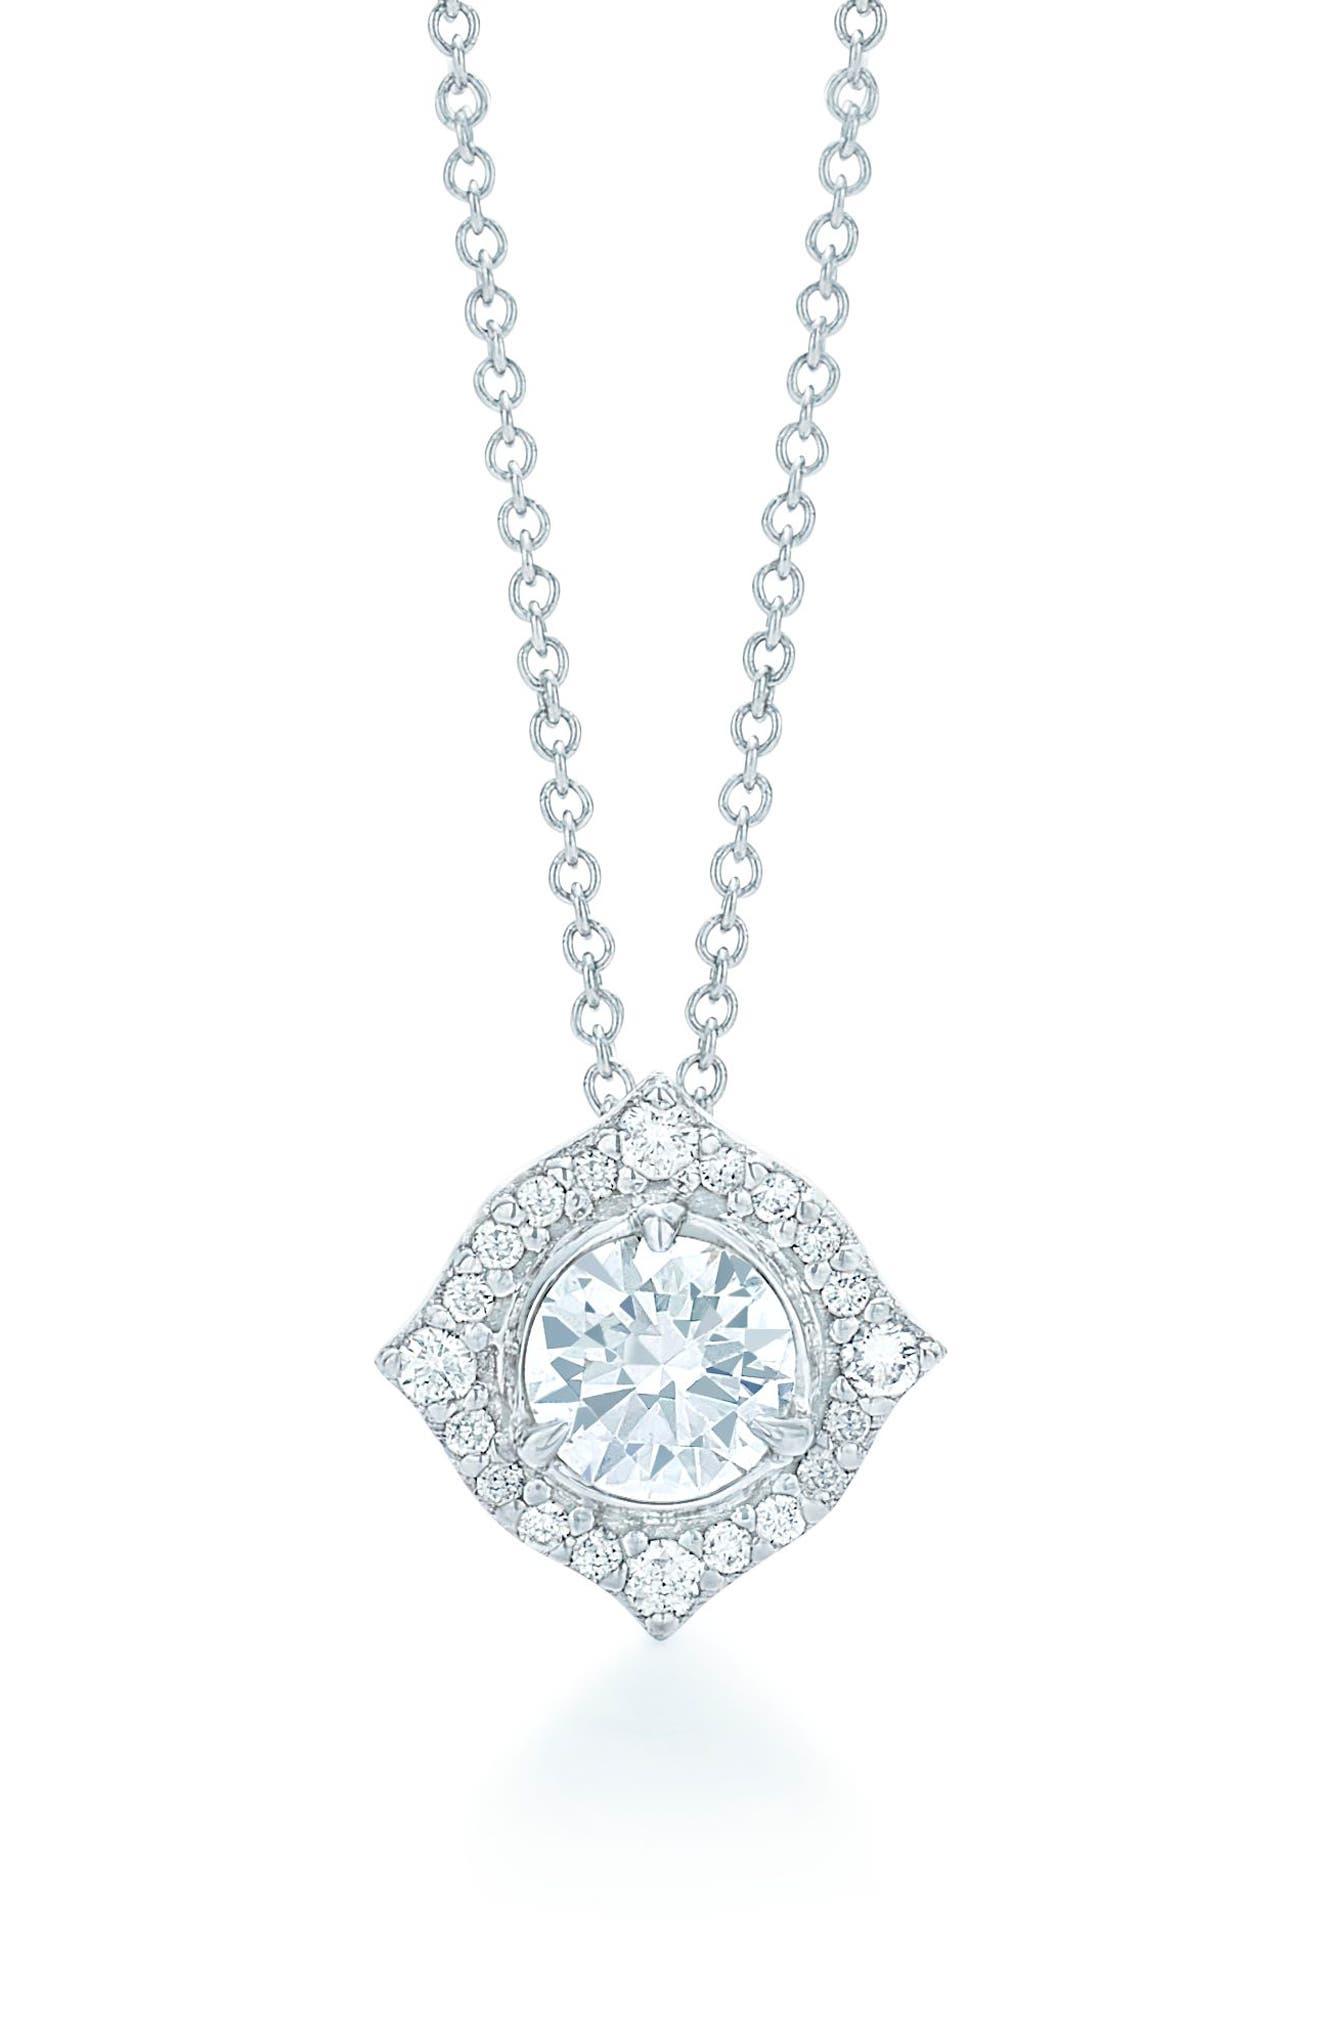 Halo Diamond Pendant Necklace,                         Main,                         color, White Gold